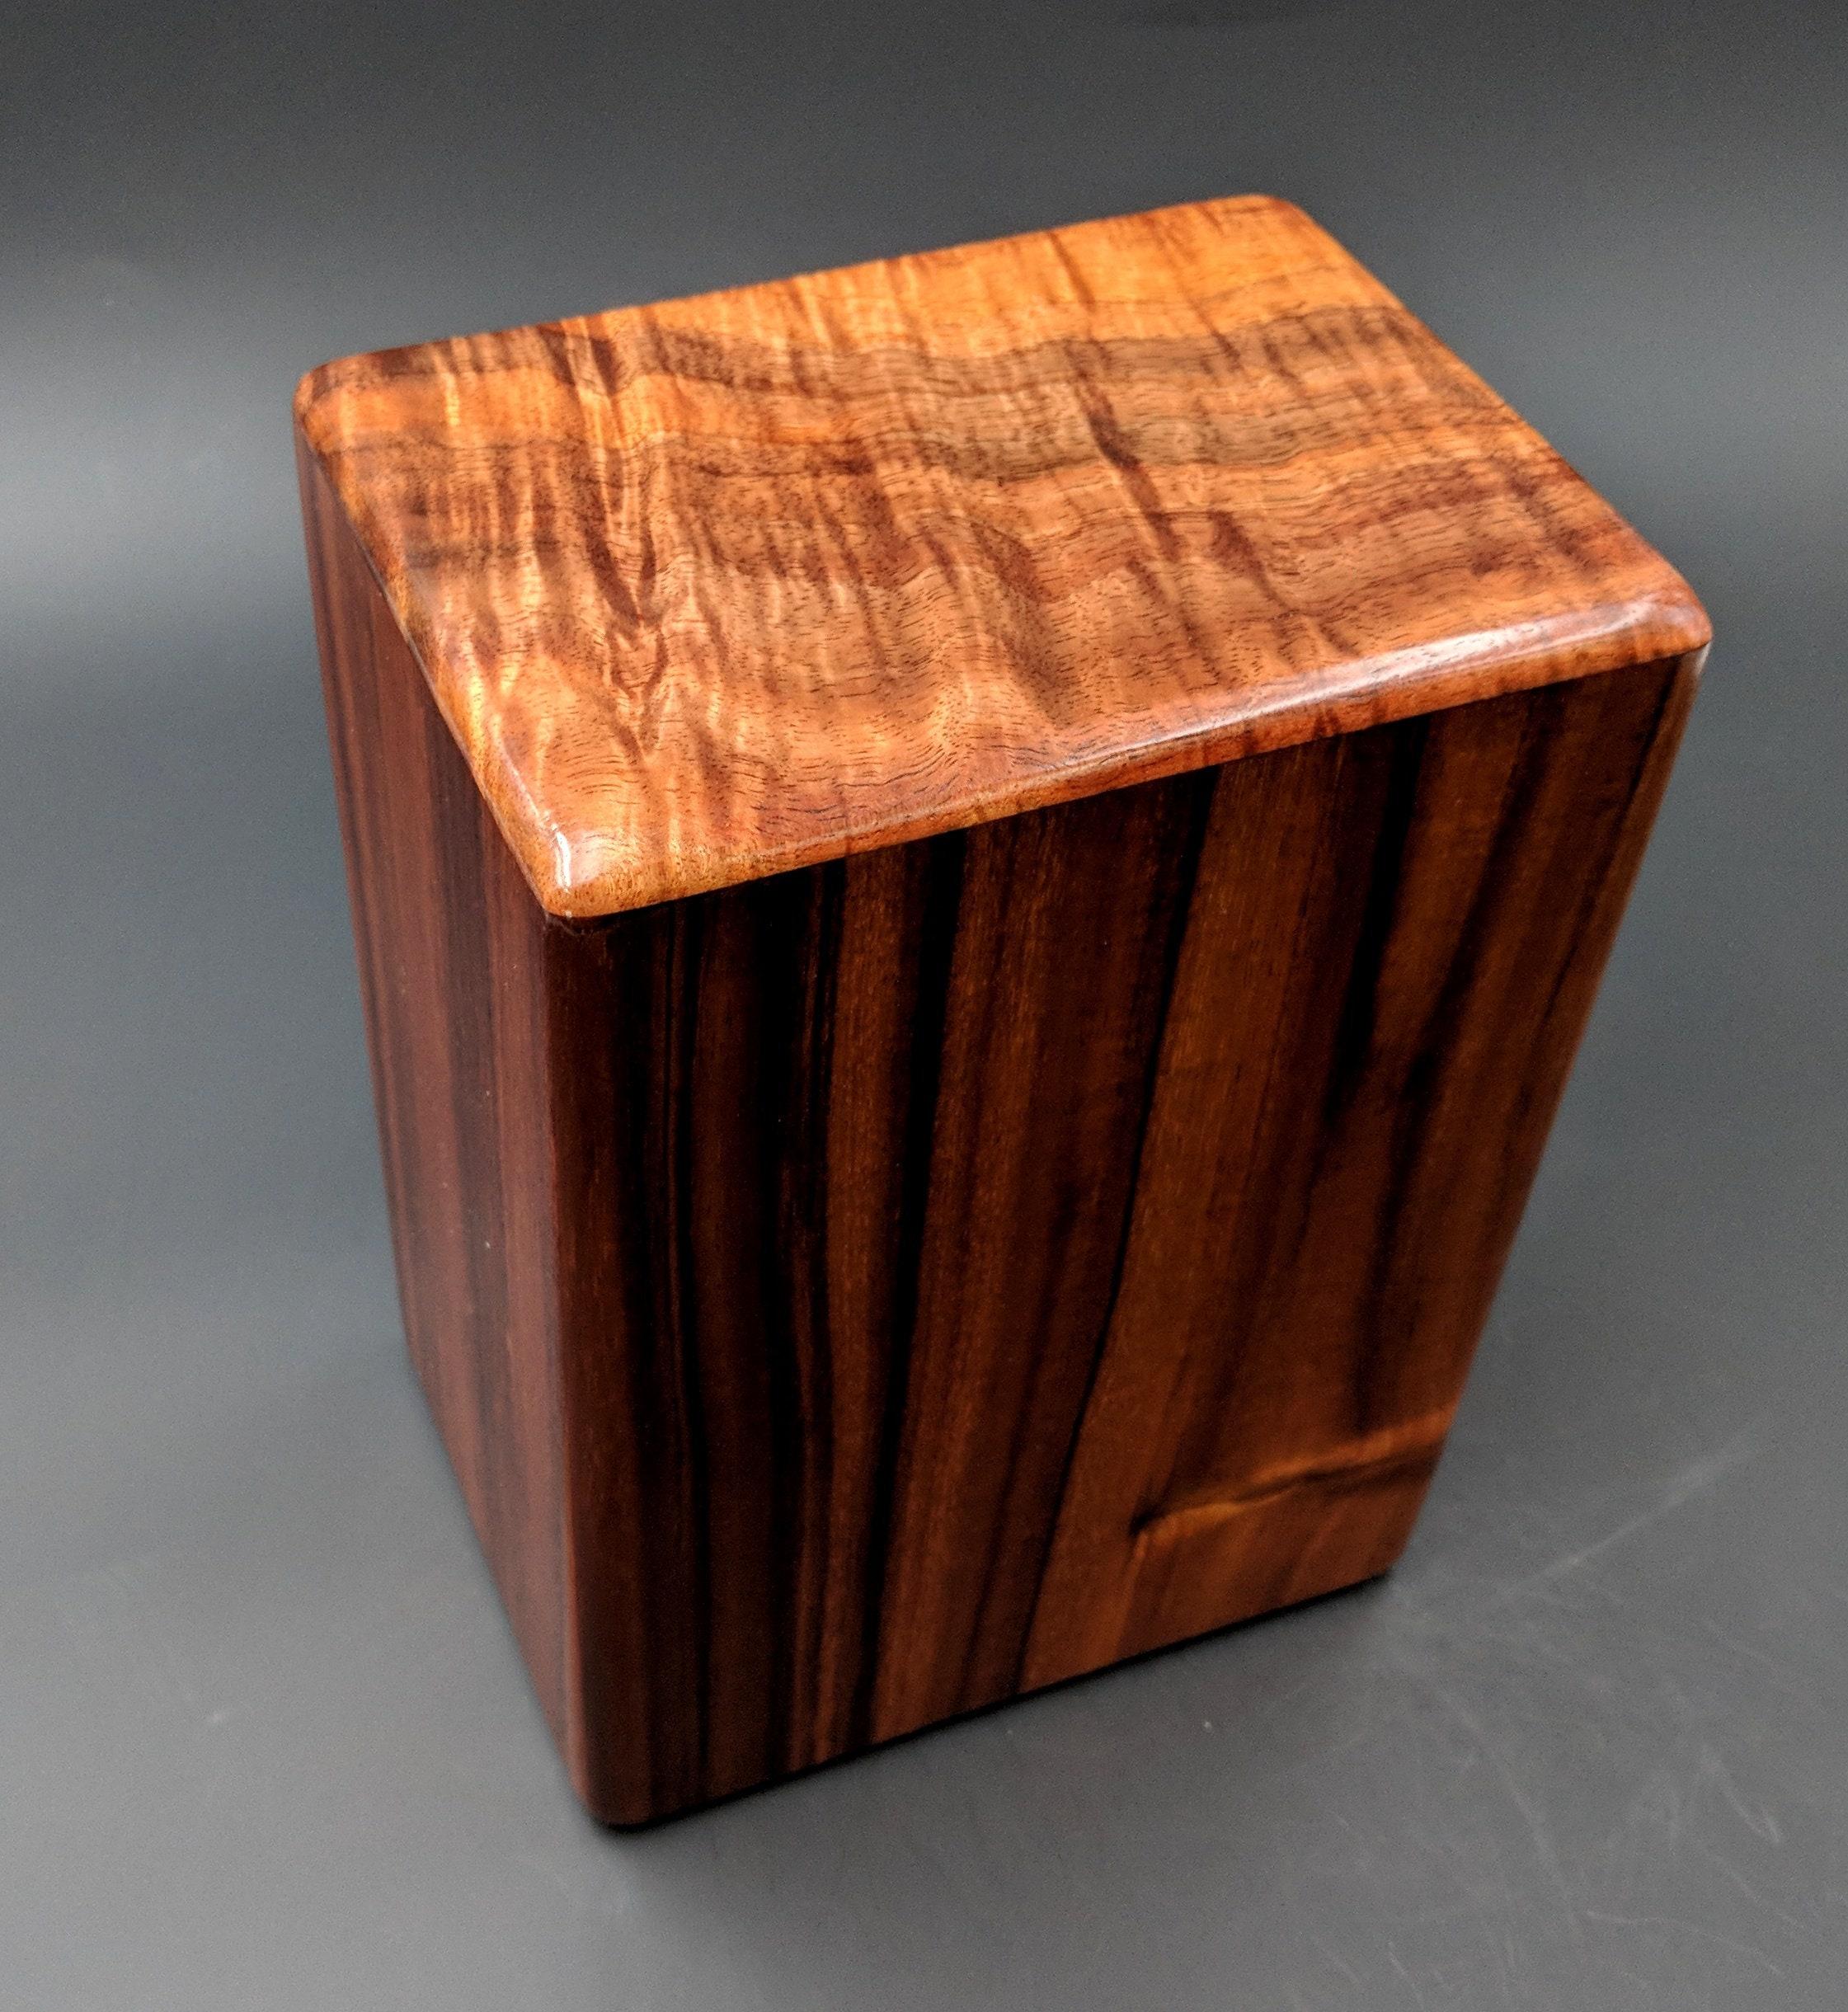 Large Curly Hawaiian Koa Wooden Memorial Cremation Urn 7wide